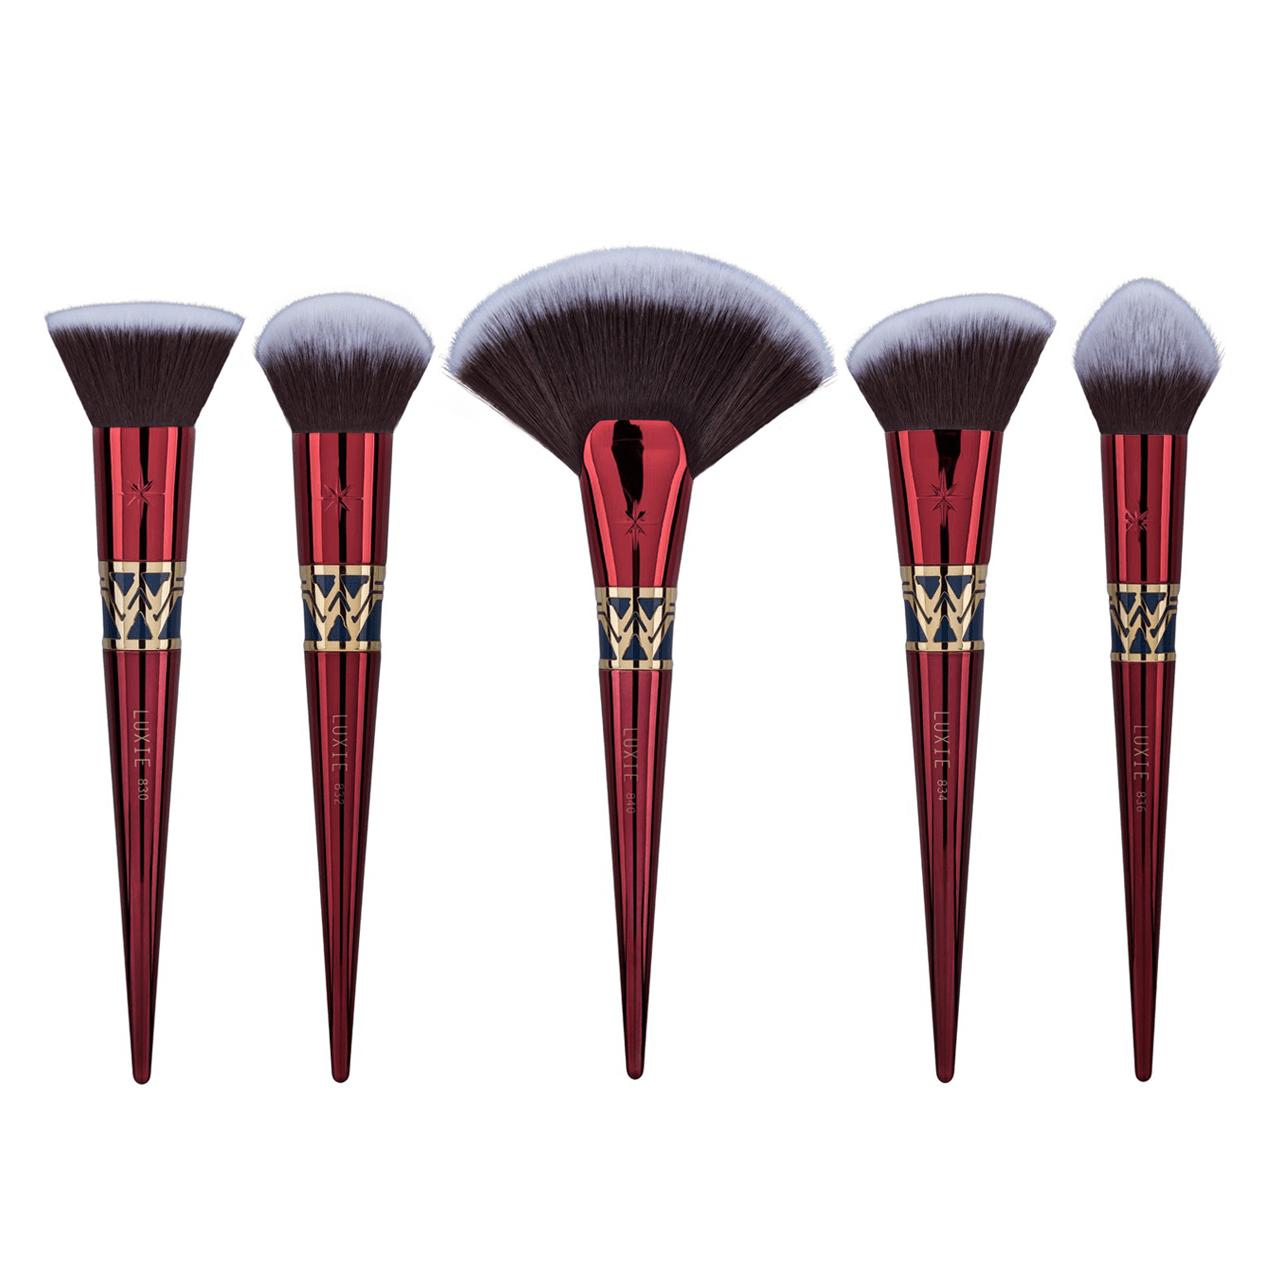 Luxie - Wonder Woman Brush Set